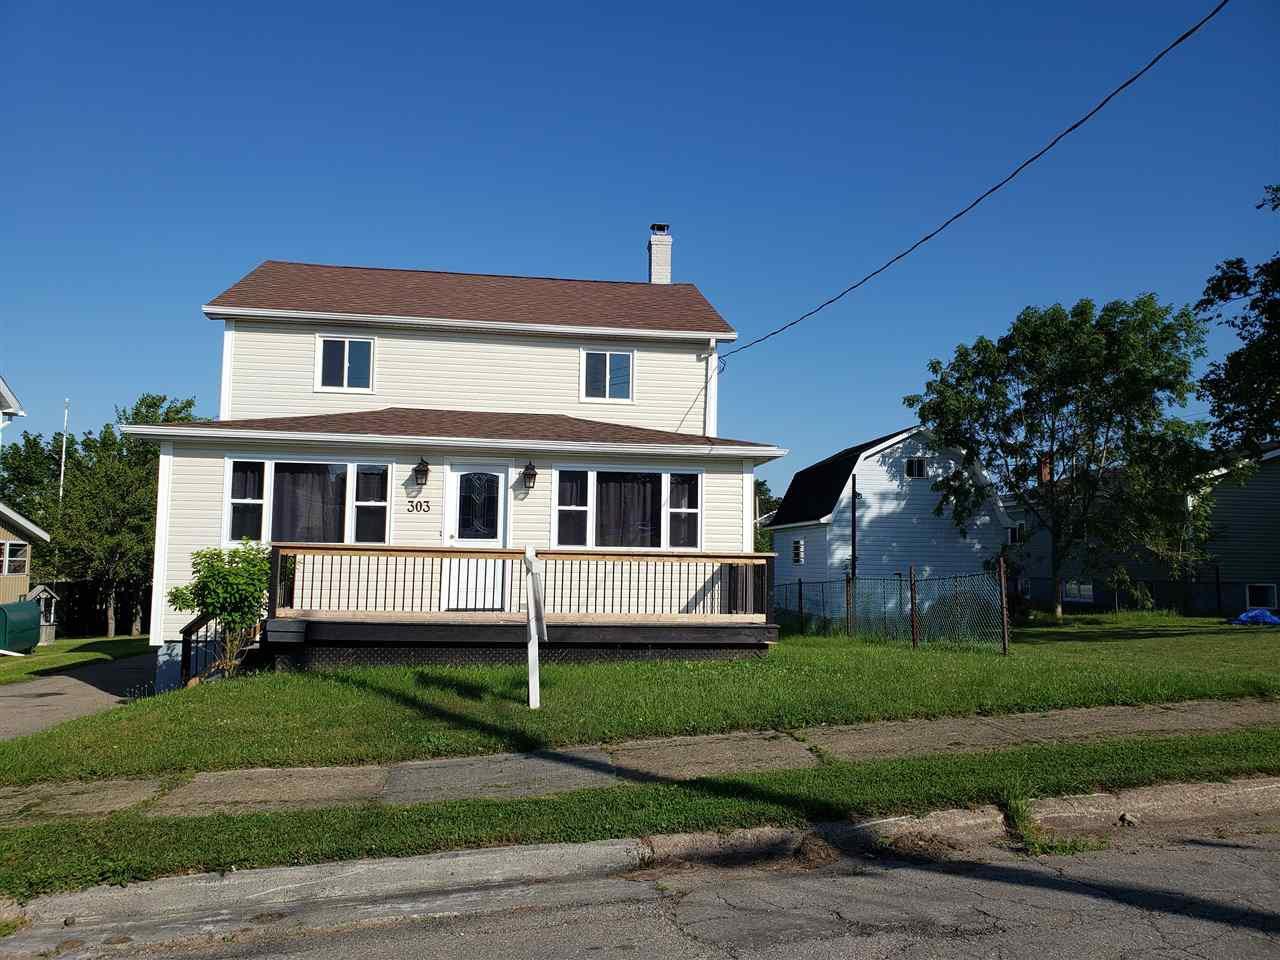 Main Photo: 303 Cherry Street in Sydney: 201-Sydney Residential for sale (Cape Breton)  : MLS®# 202014427